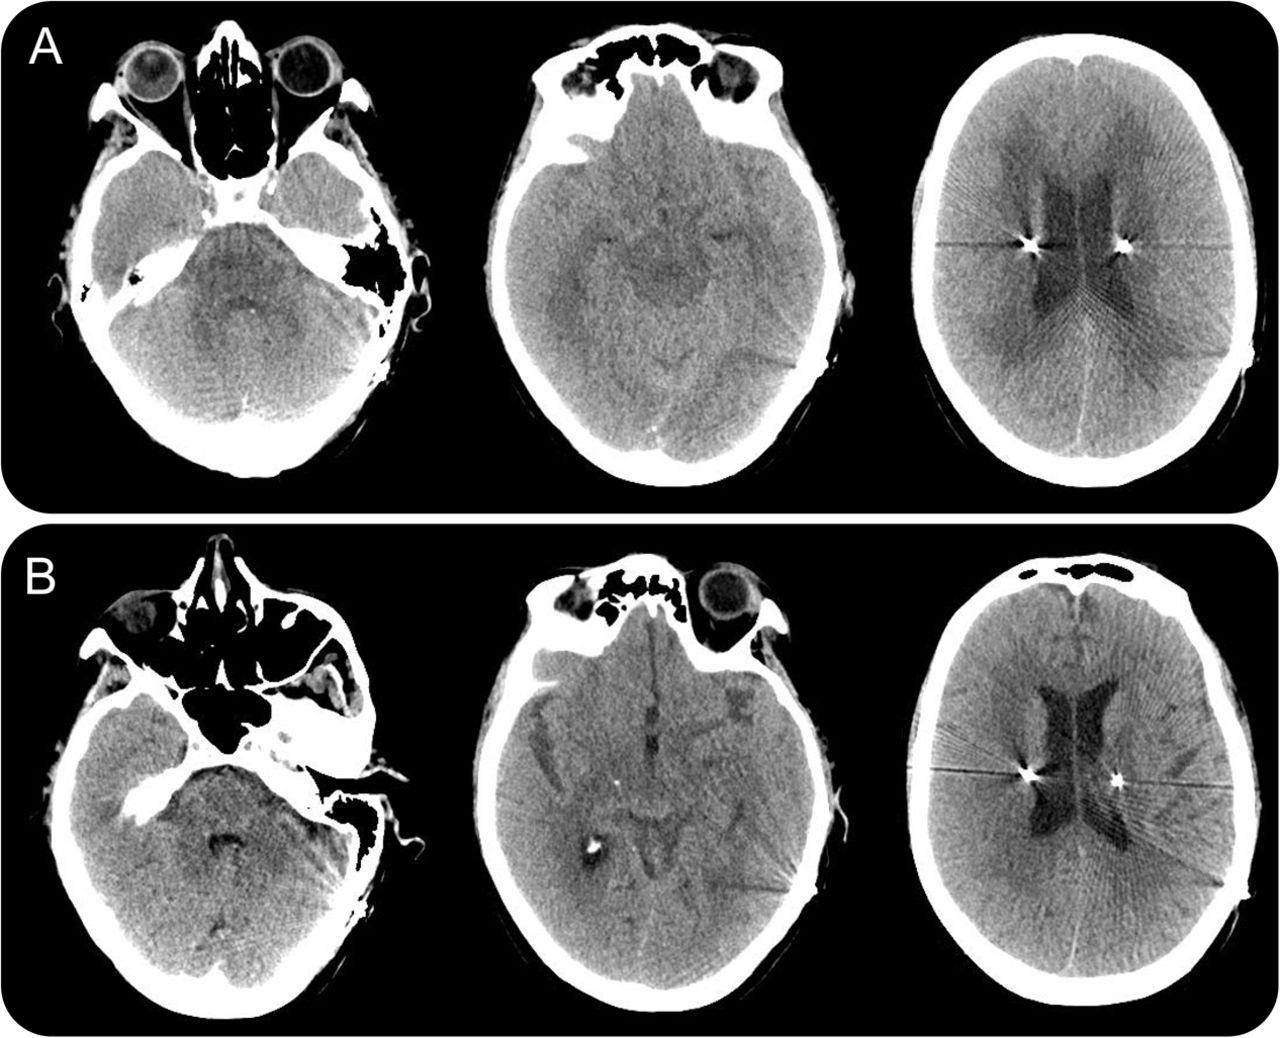 teaching neuroimages  massive cerebral edema after ct